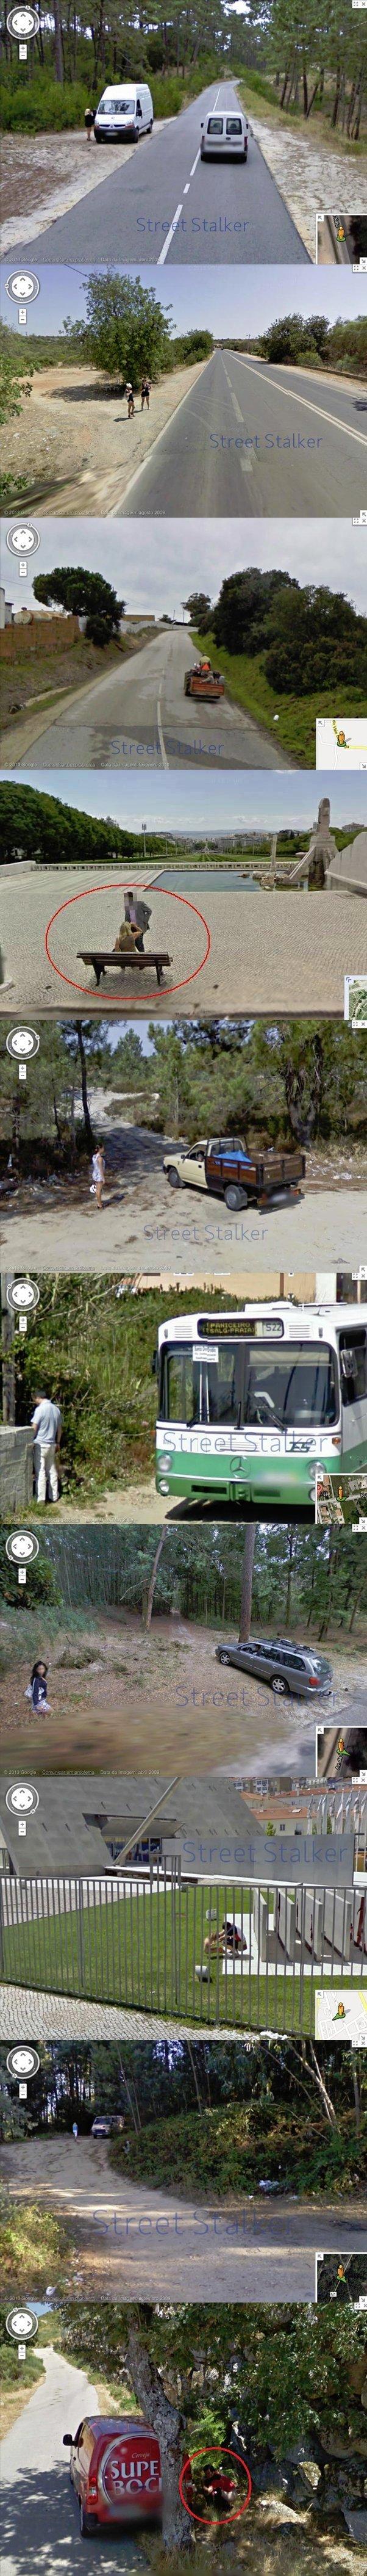 Portugal on Google Street. . p. all Portugal on Google Street p all